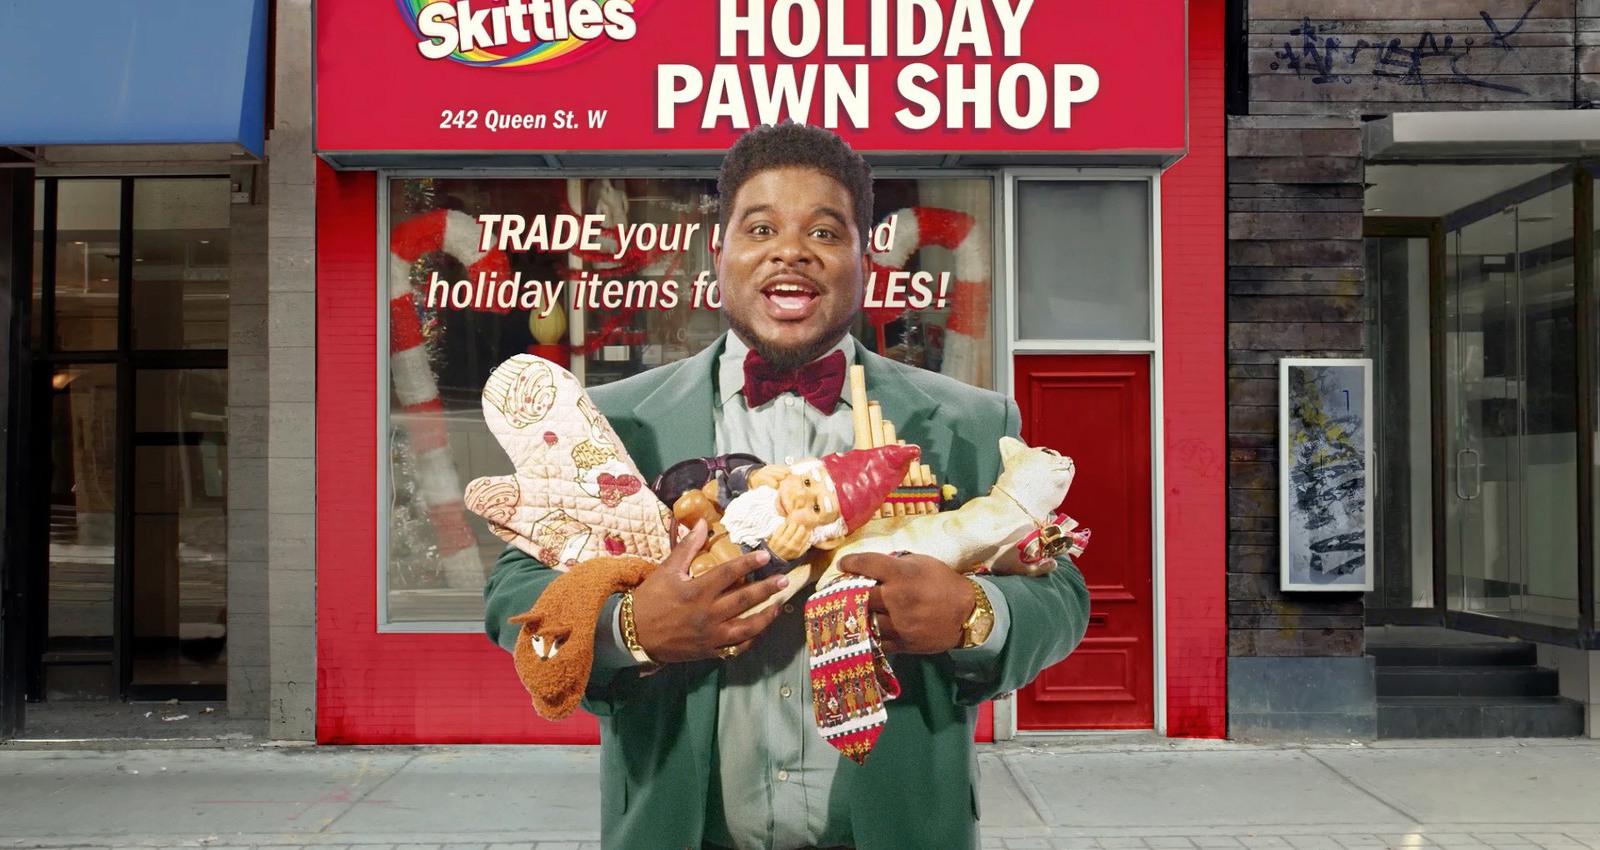 Skittles Holiday Pawn Shop